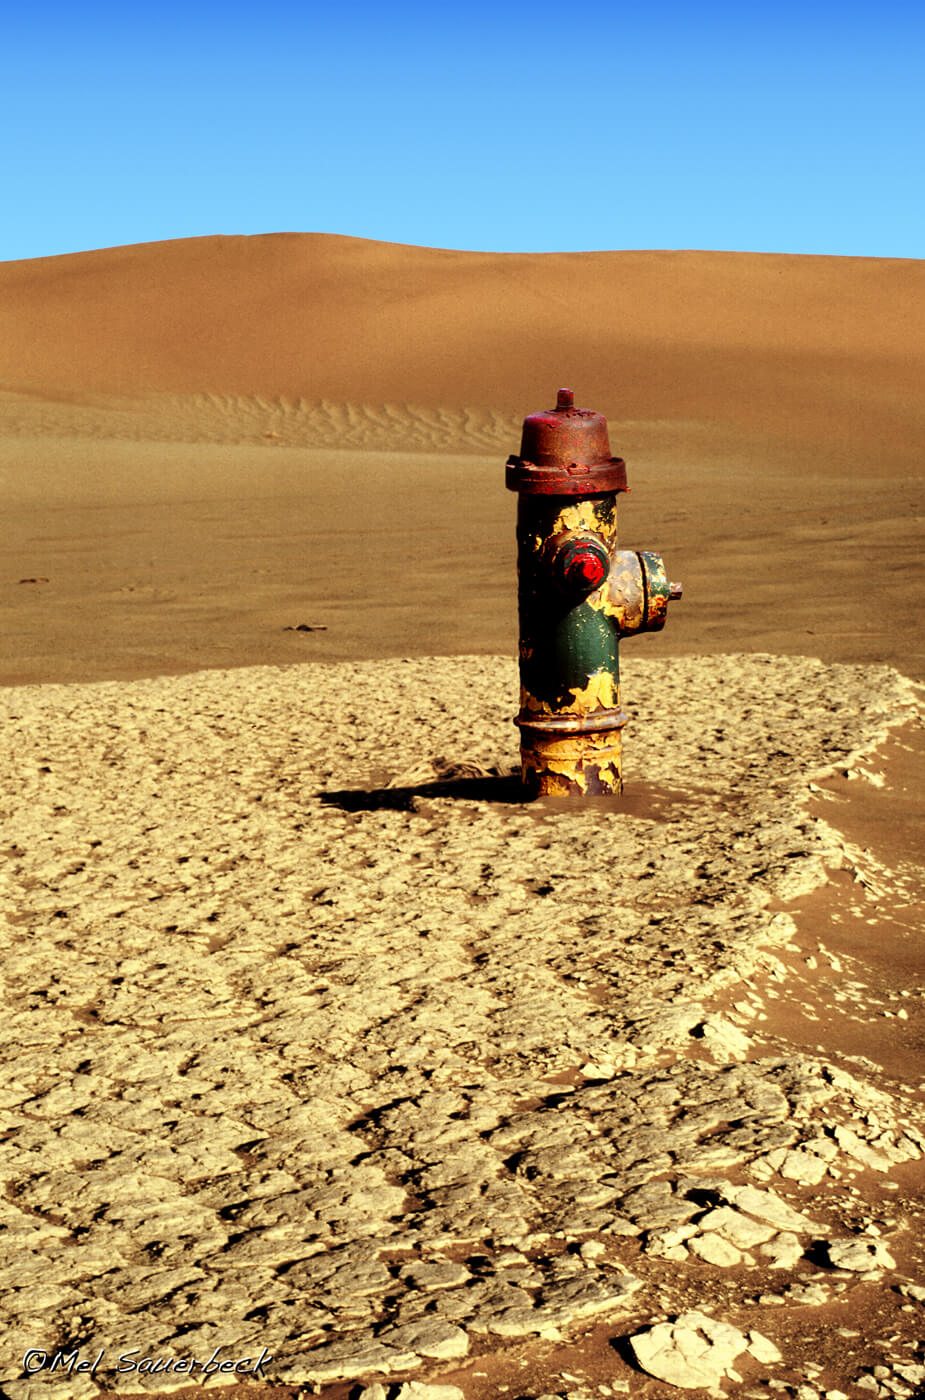 Fire Hydrant in Desert